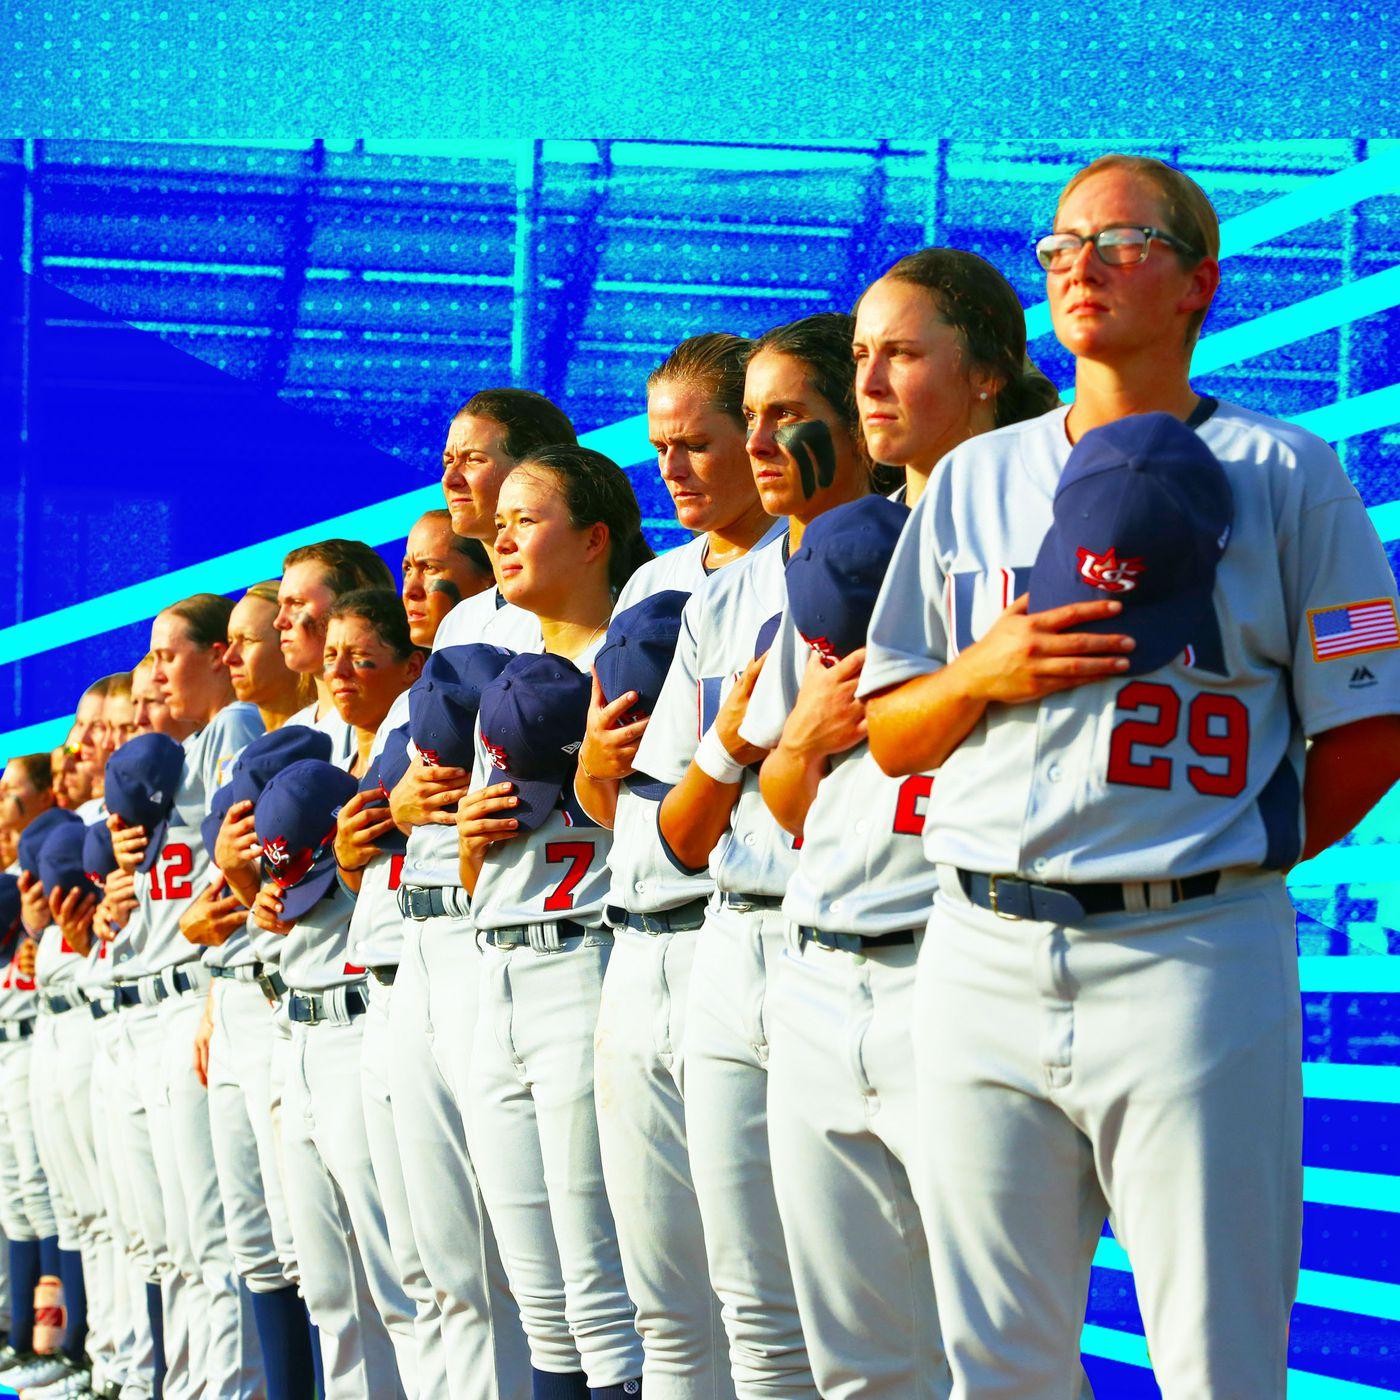 Team USA women's baseball players describe why America won't